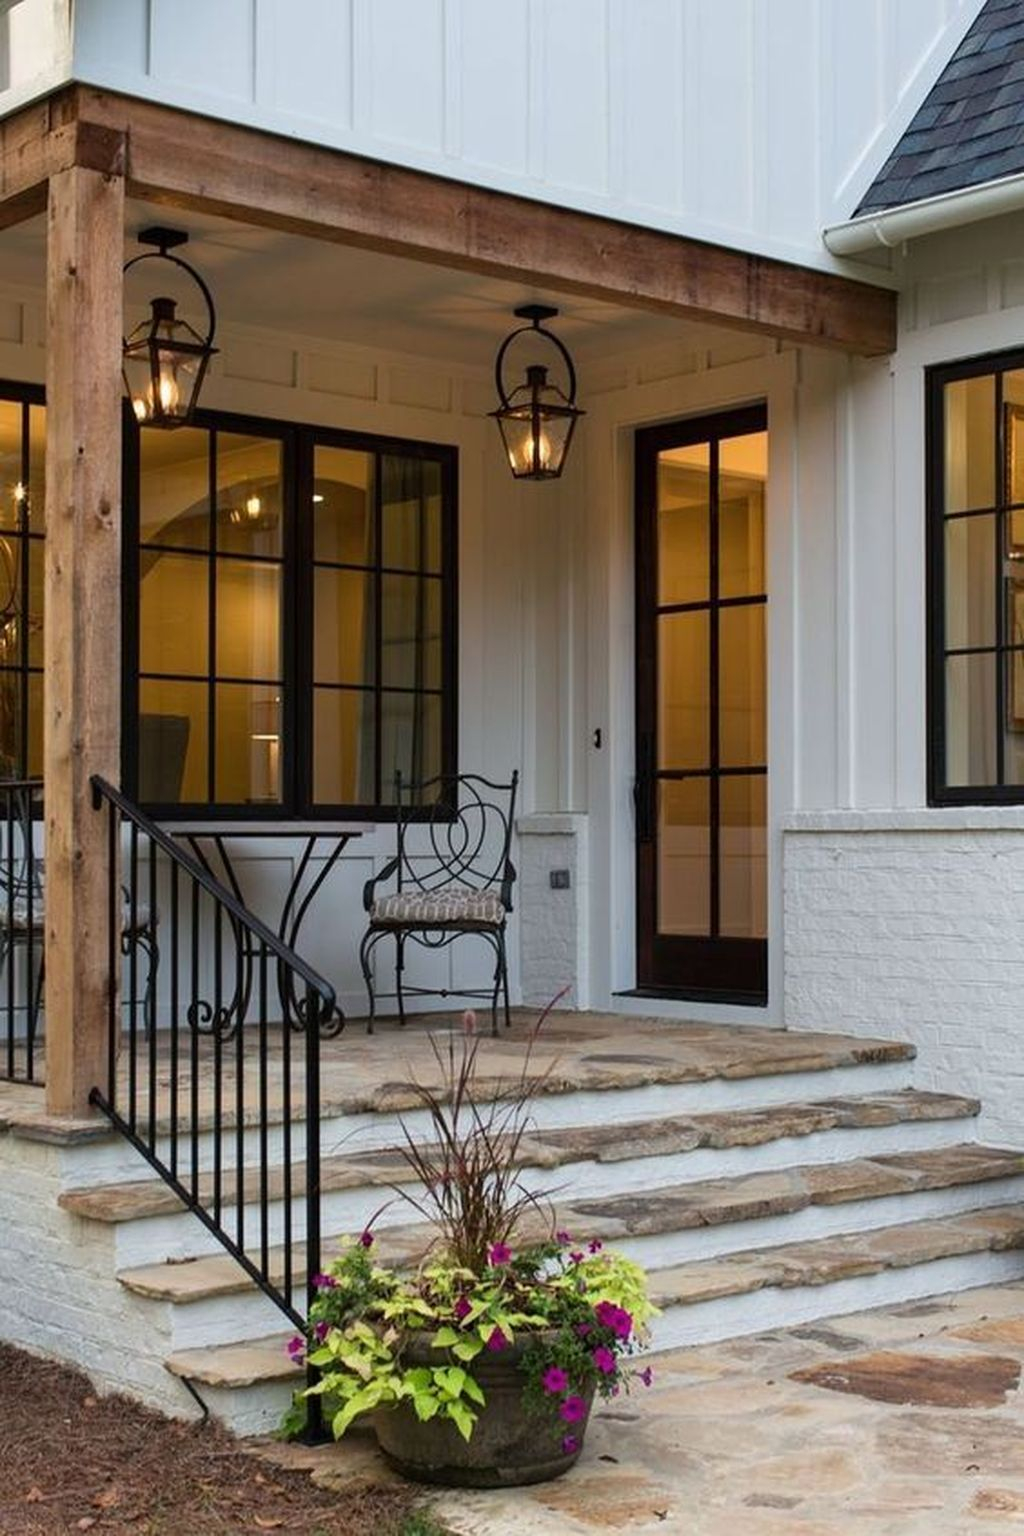 Captivating Farmhouse Exterior House Design Ideas To Copy Right Now 16